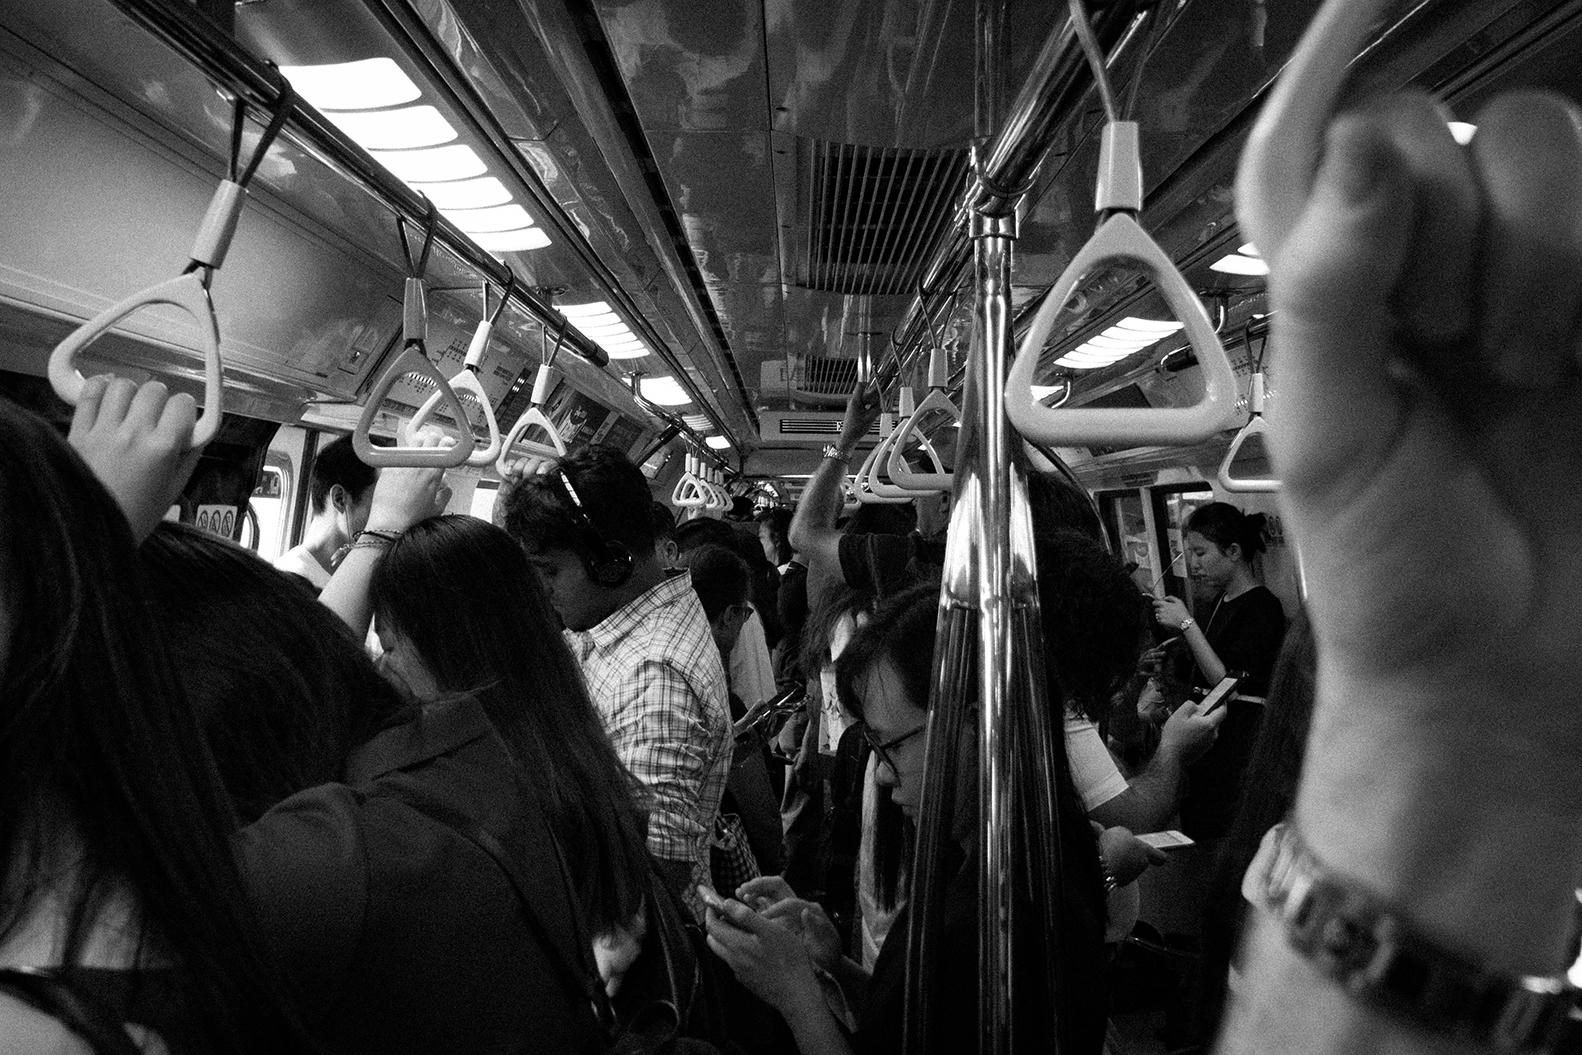 Crowded MRT train in Singapore